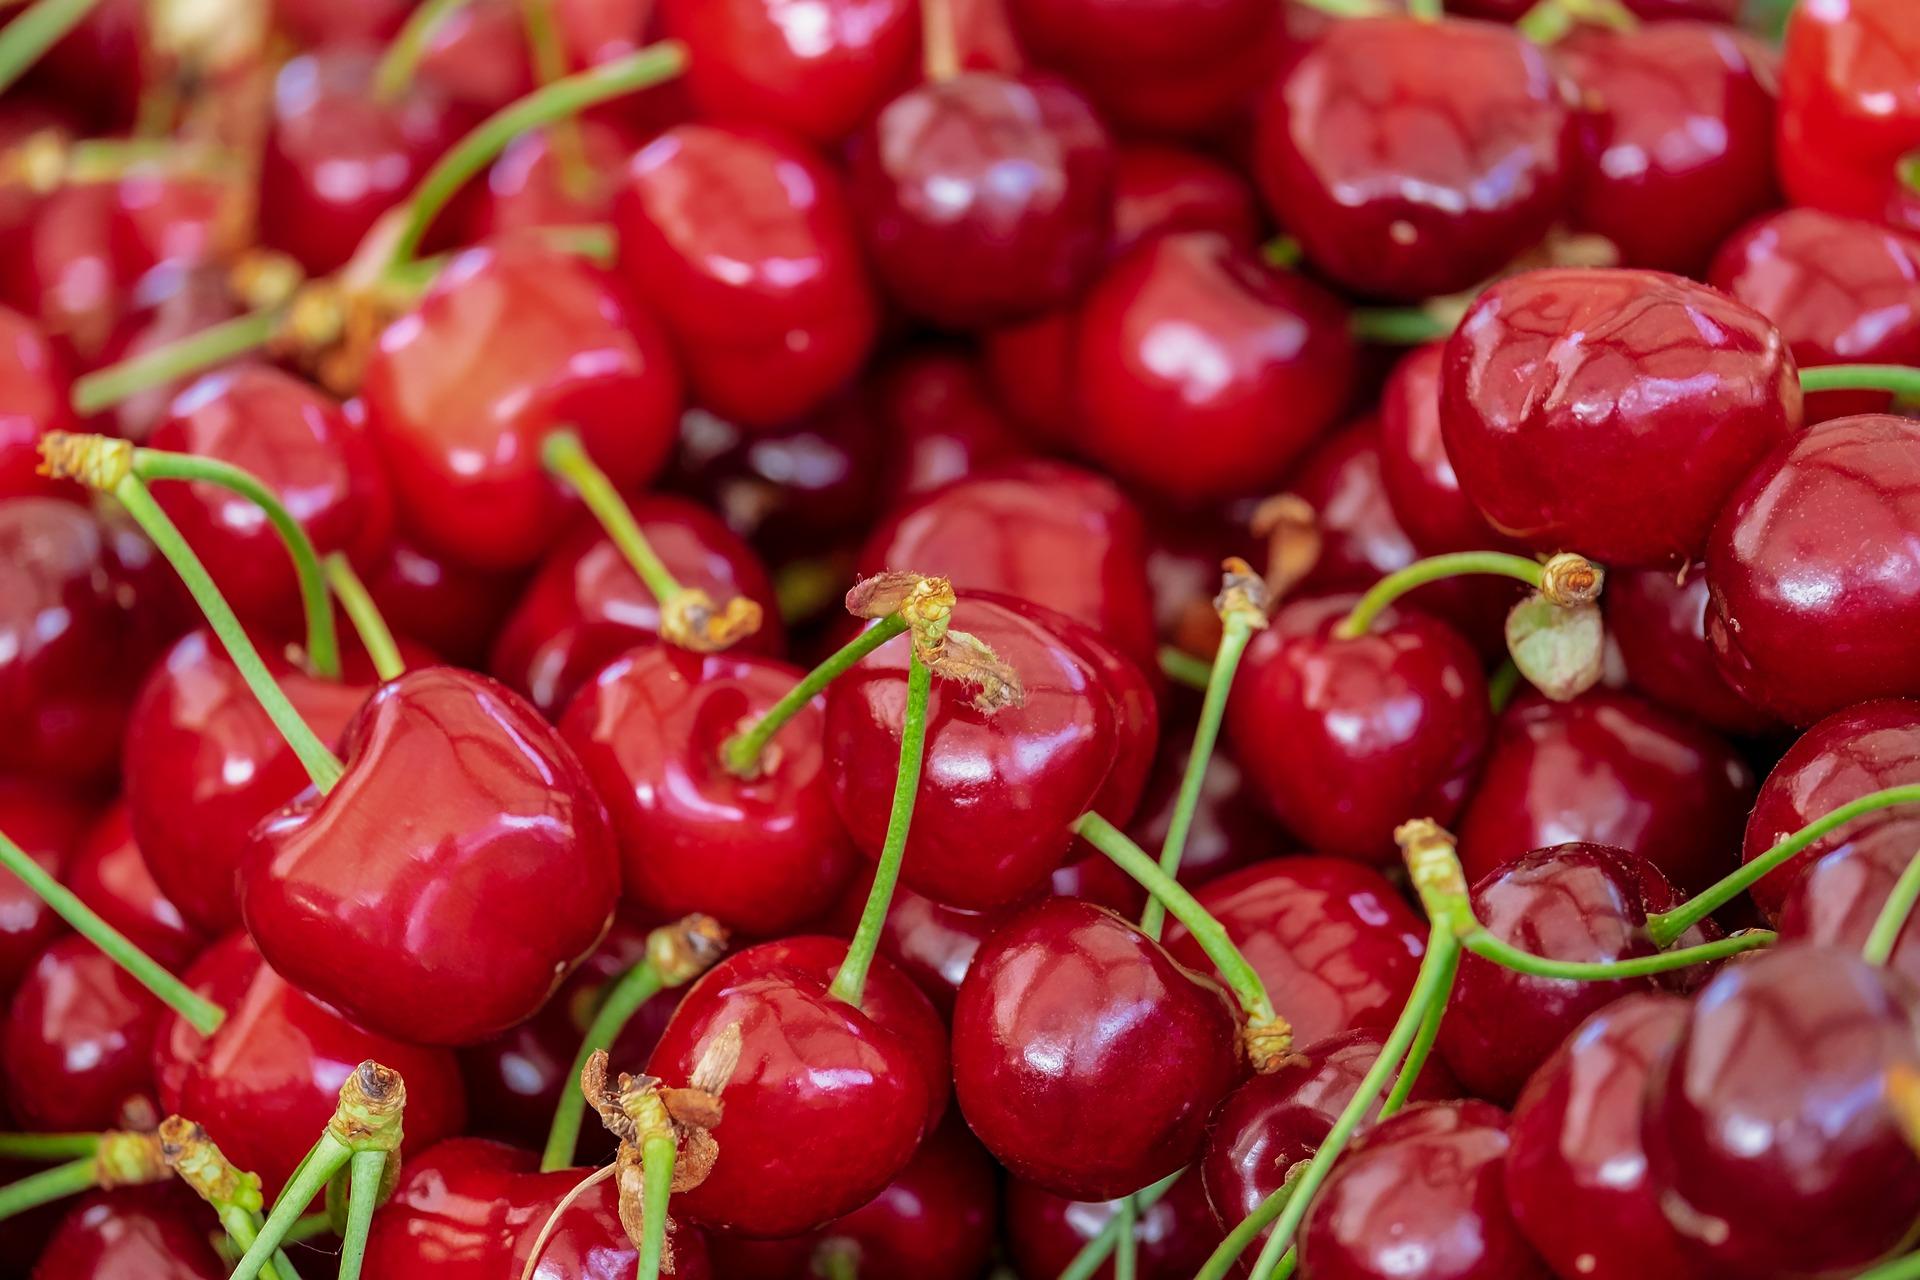 cherries-3433775_1920.jpg